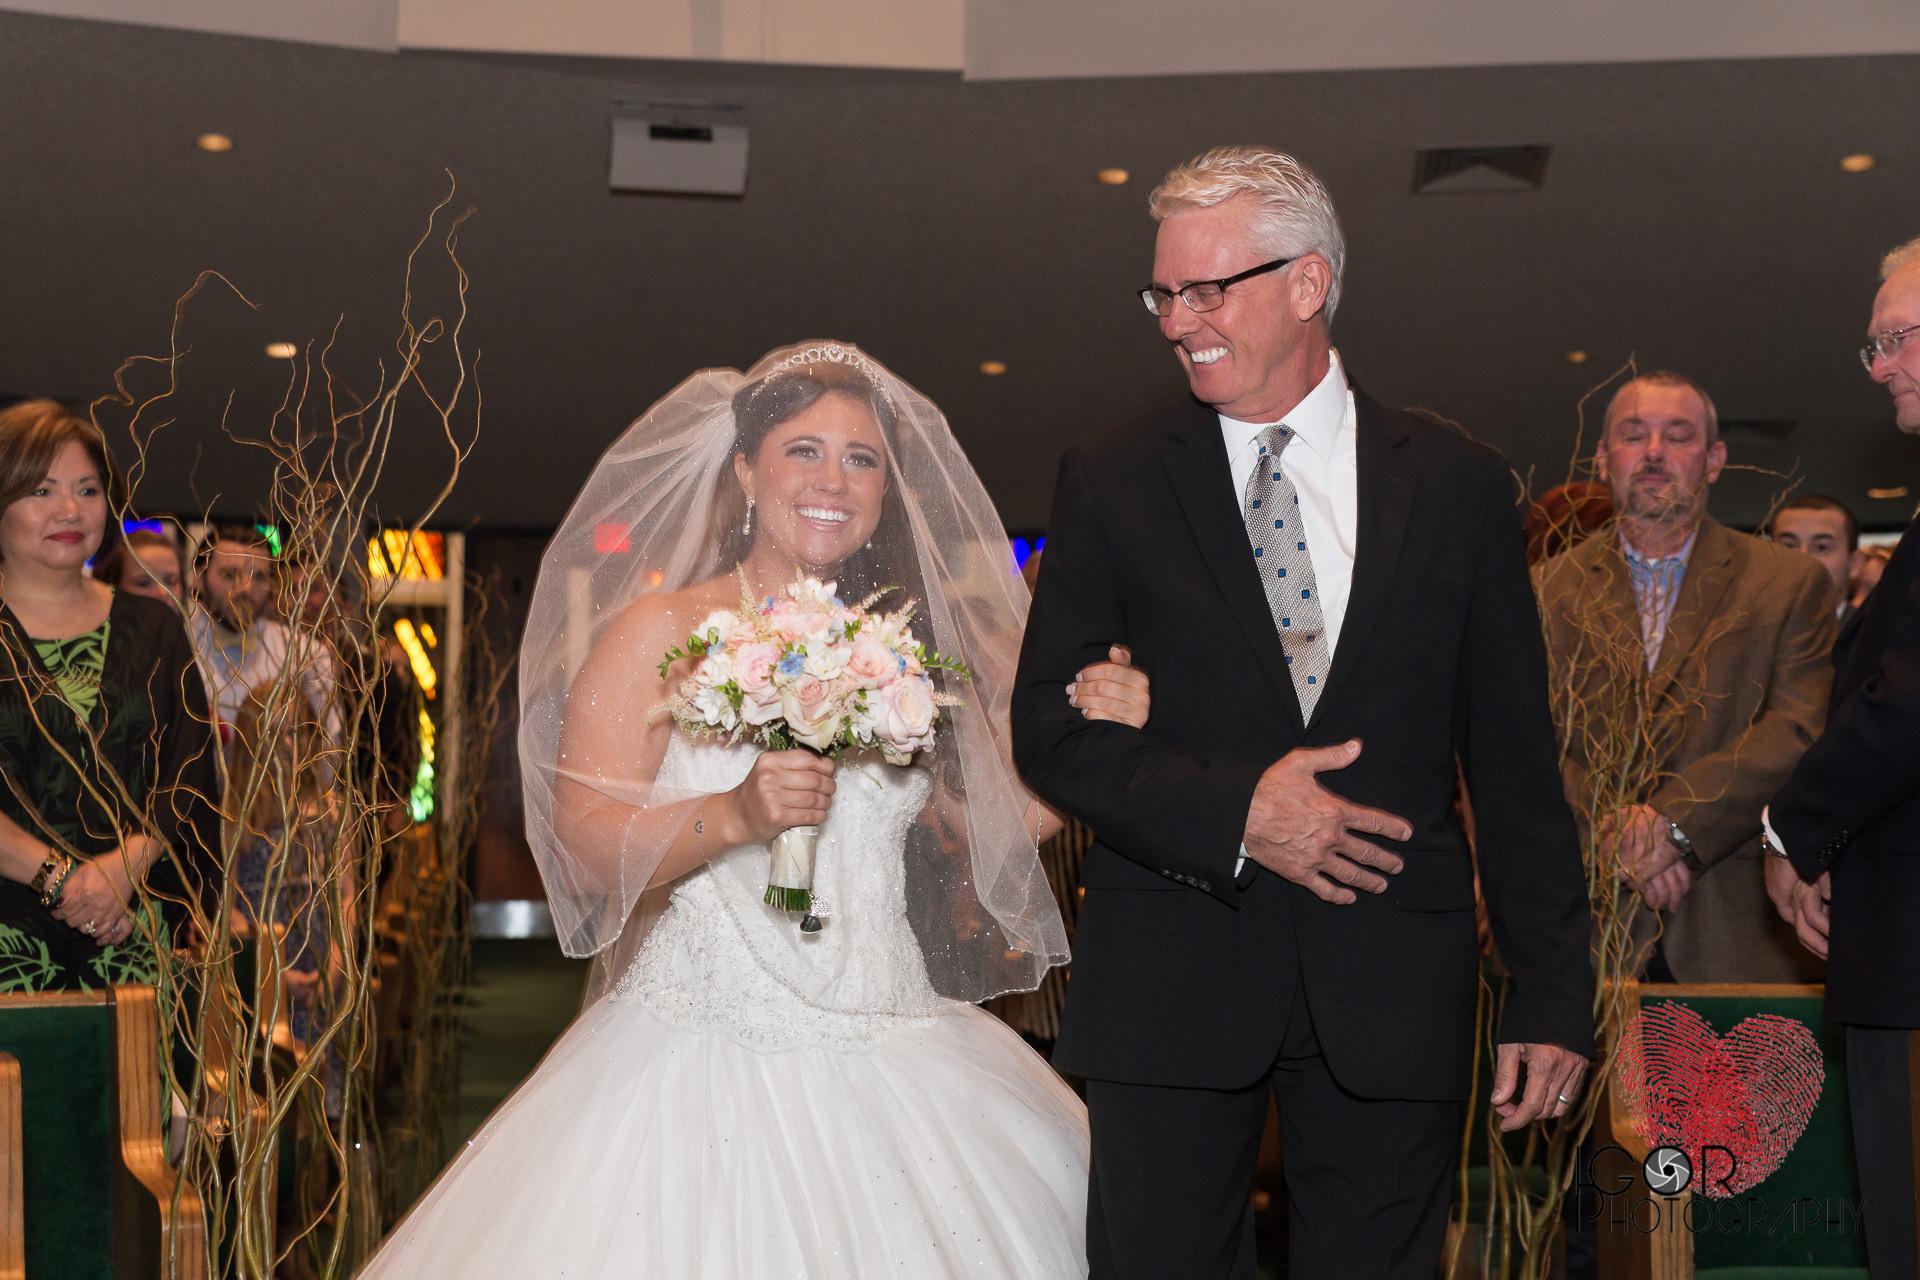 The giddiest bride ever!